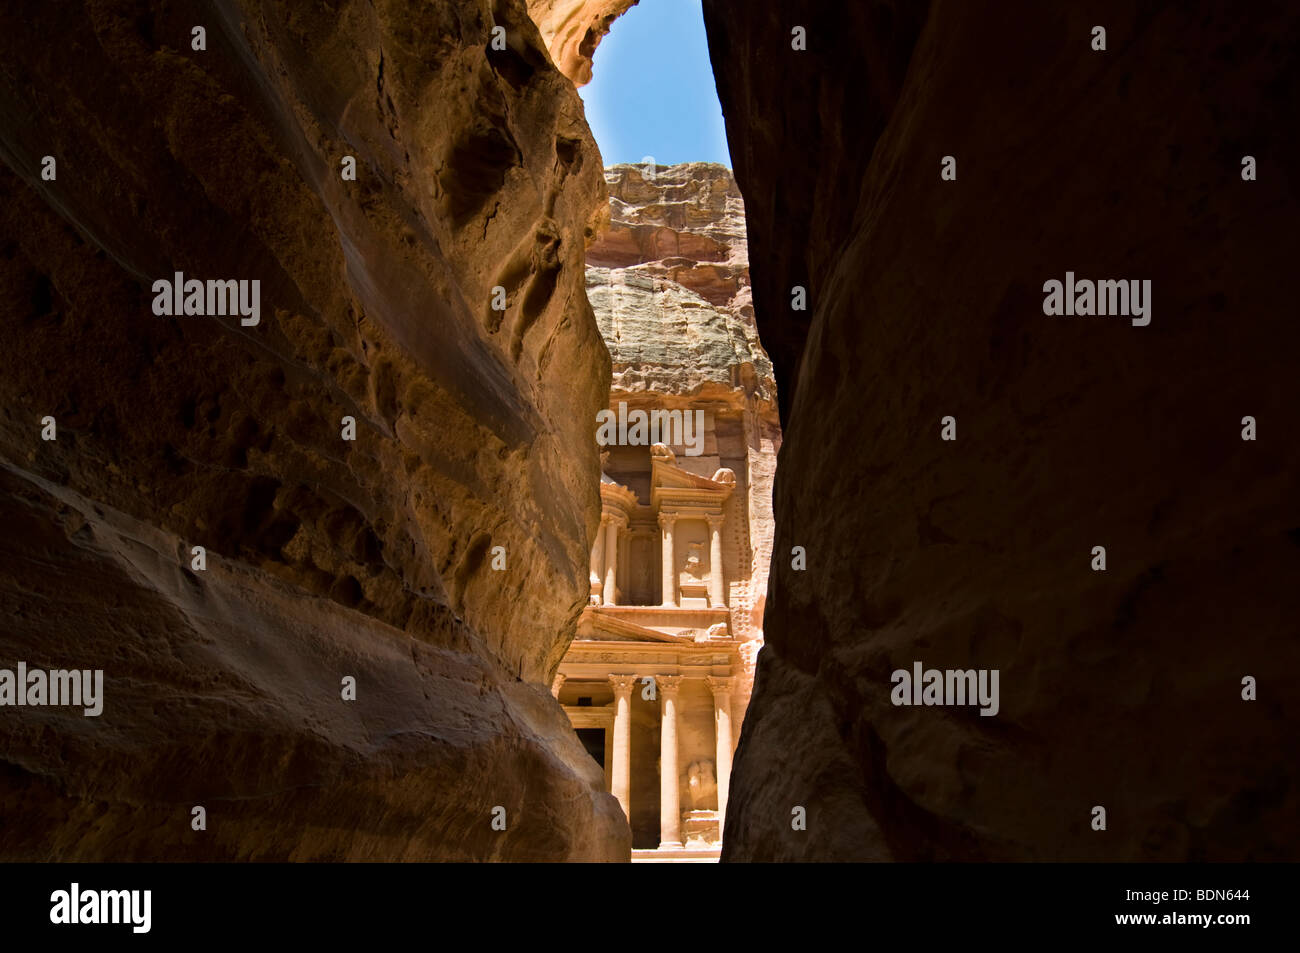 The Treasury seen through the Siq at Petra. - Stock Image